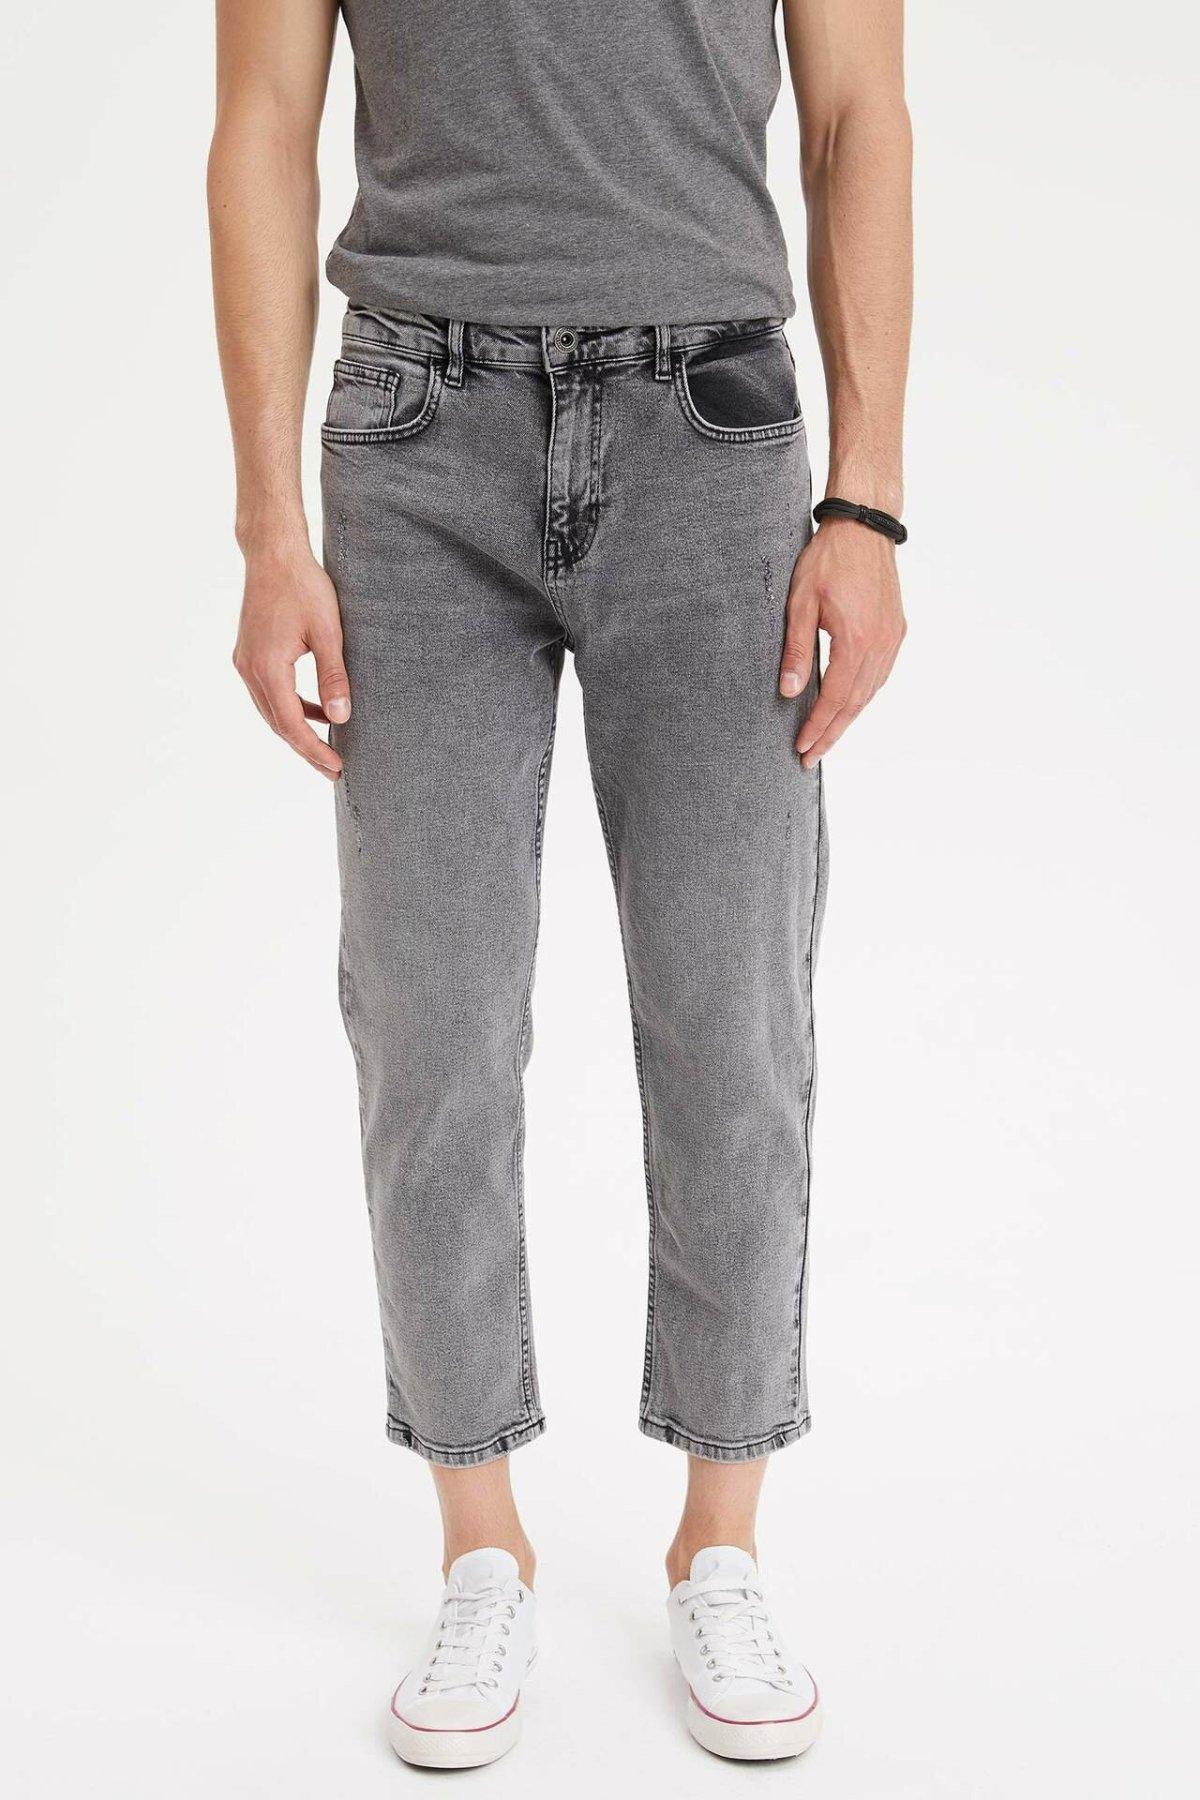 DeFacto Man Summer Light Grey Washed Ninth Denim Jeans Men Casual Straight Bottom Male Mid-waist Jeans Trousers-L3509AZ19SM